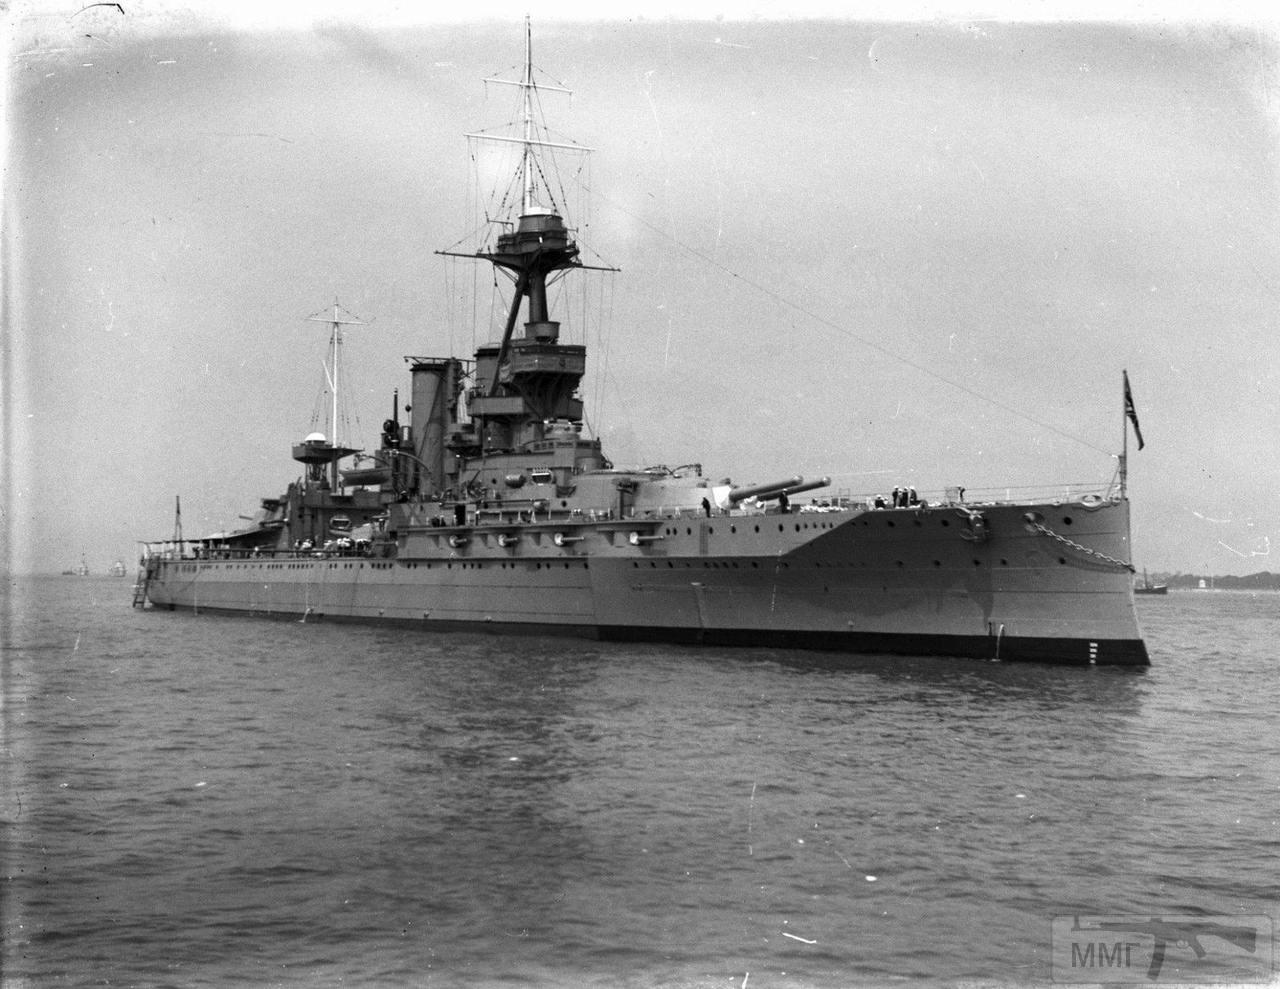 109615 - HMS Iron Duke